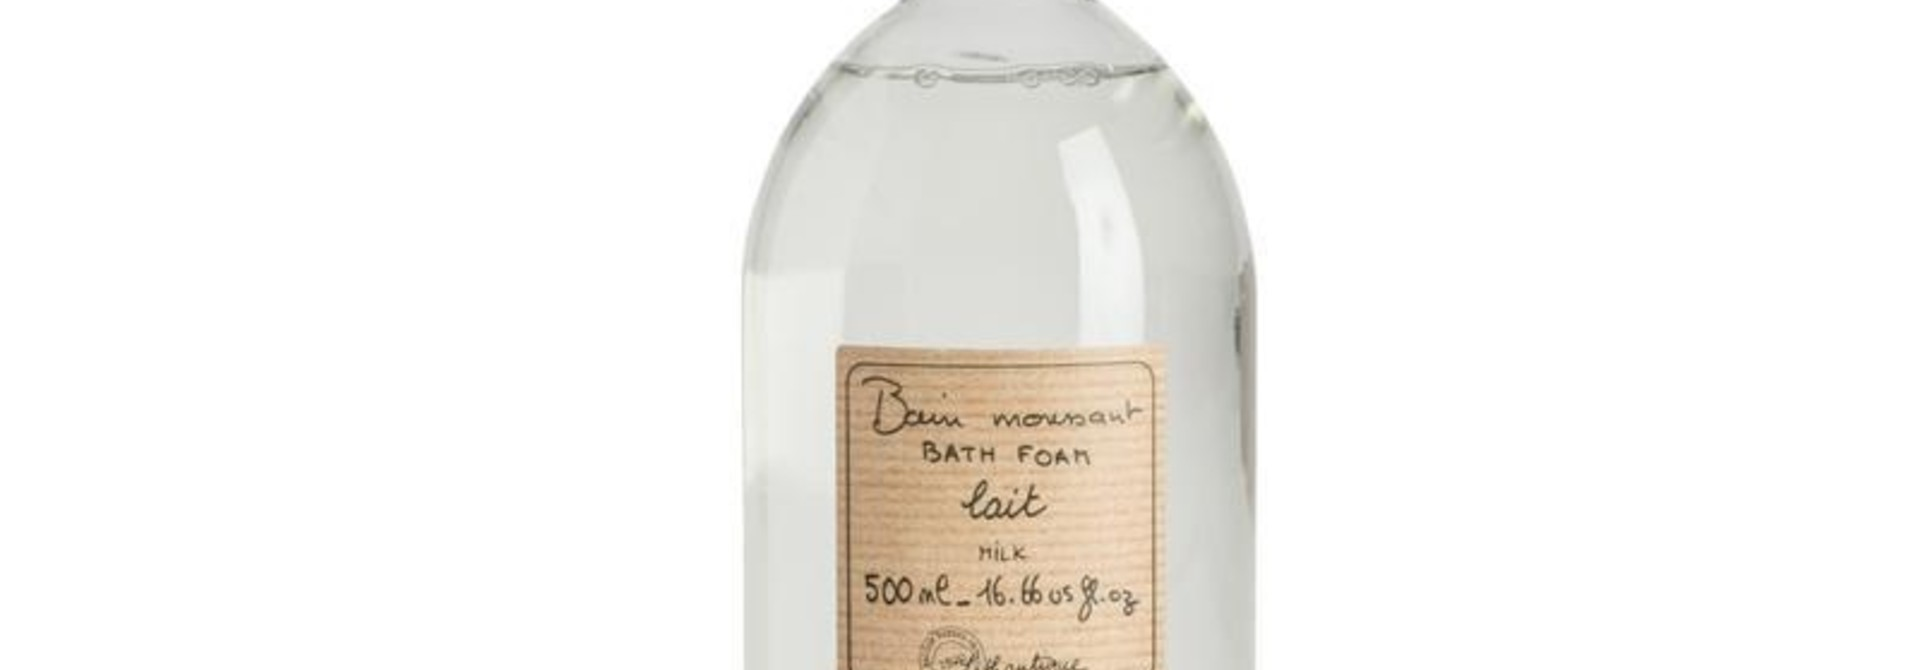 Milk - Foam Bath